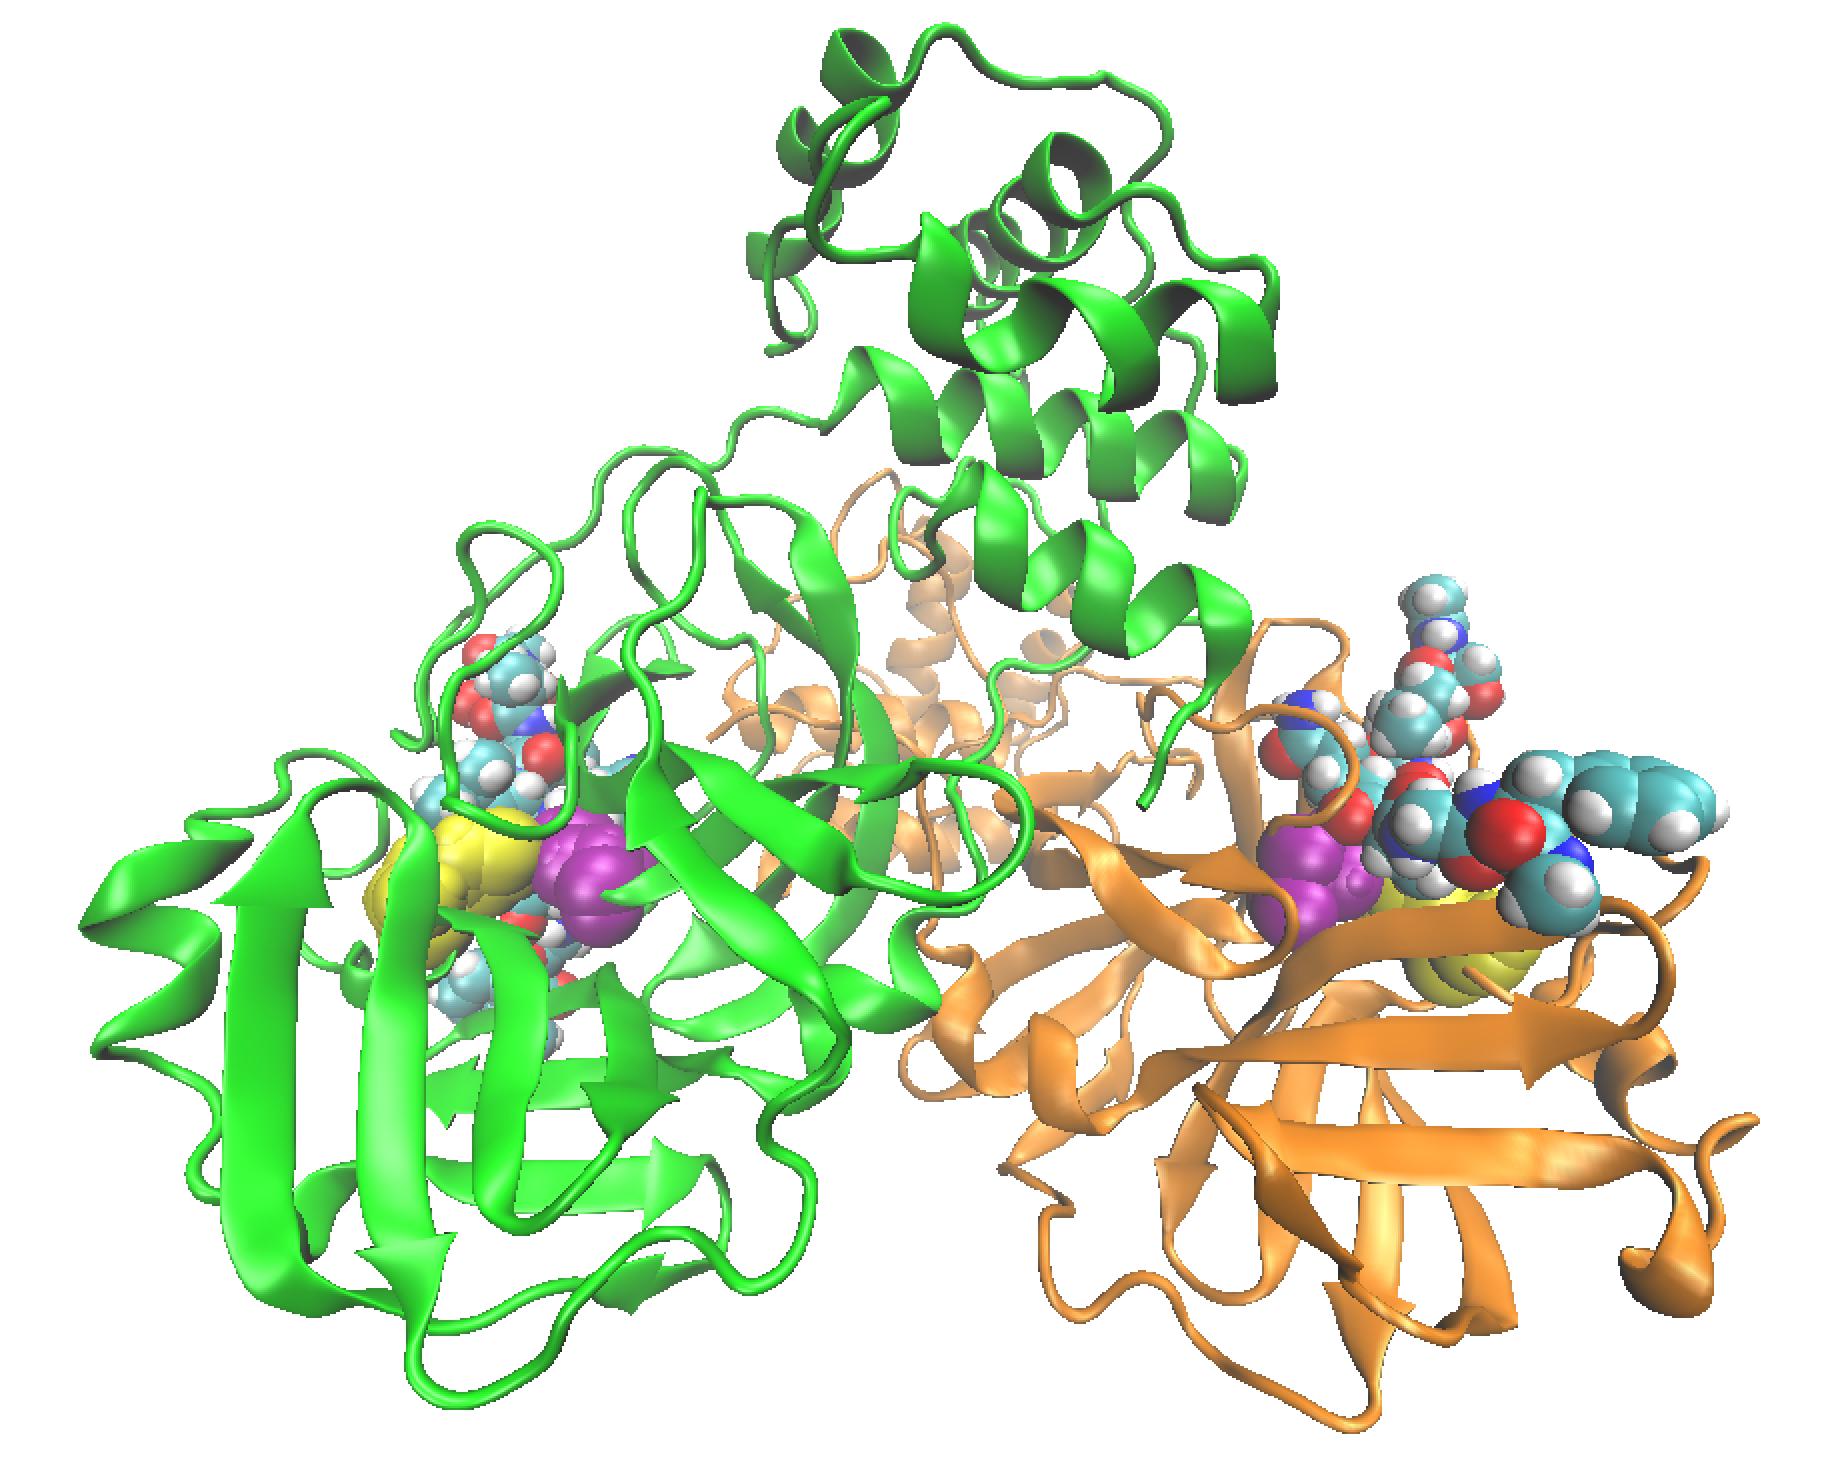 figura 2 proteasas coronavirus